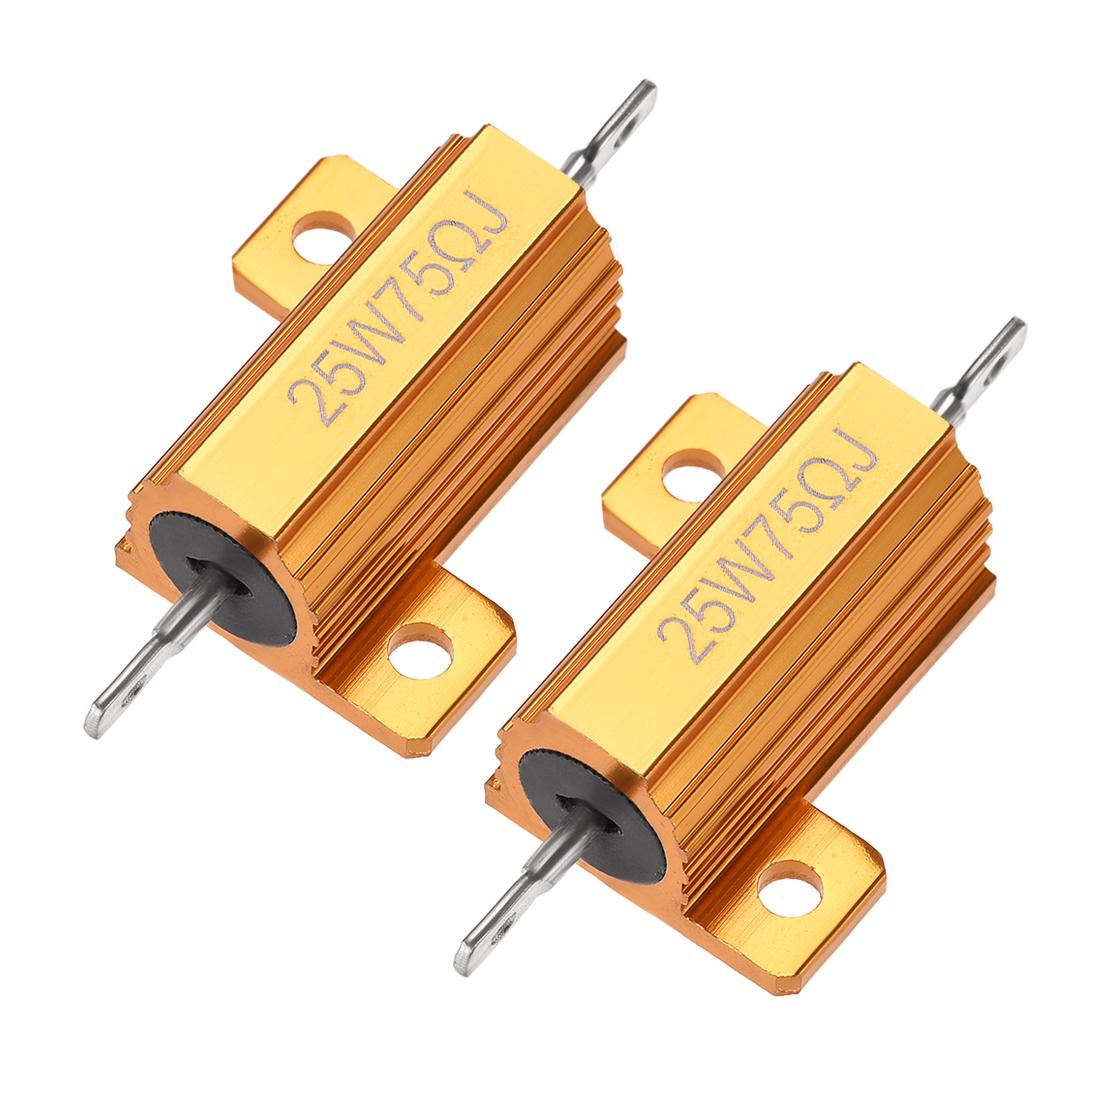 25Watt 75 Ohm 5% Aluminum Housing Resistor Wirewound Resistor Gold Tone 2 Pcs